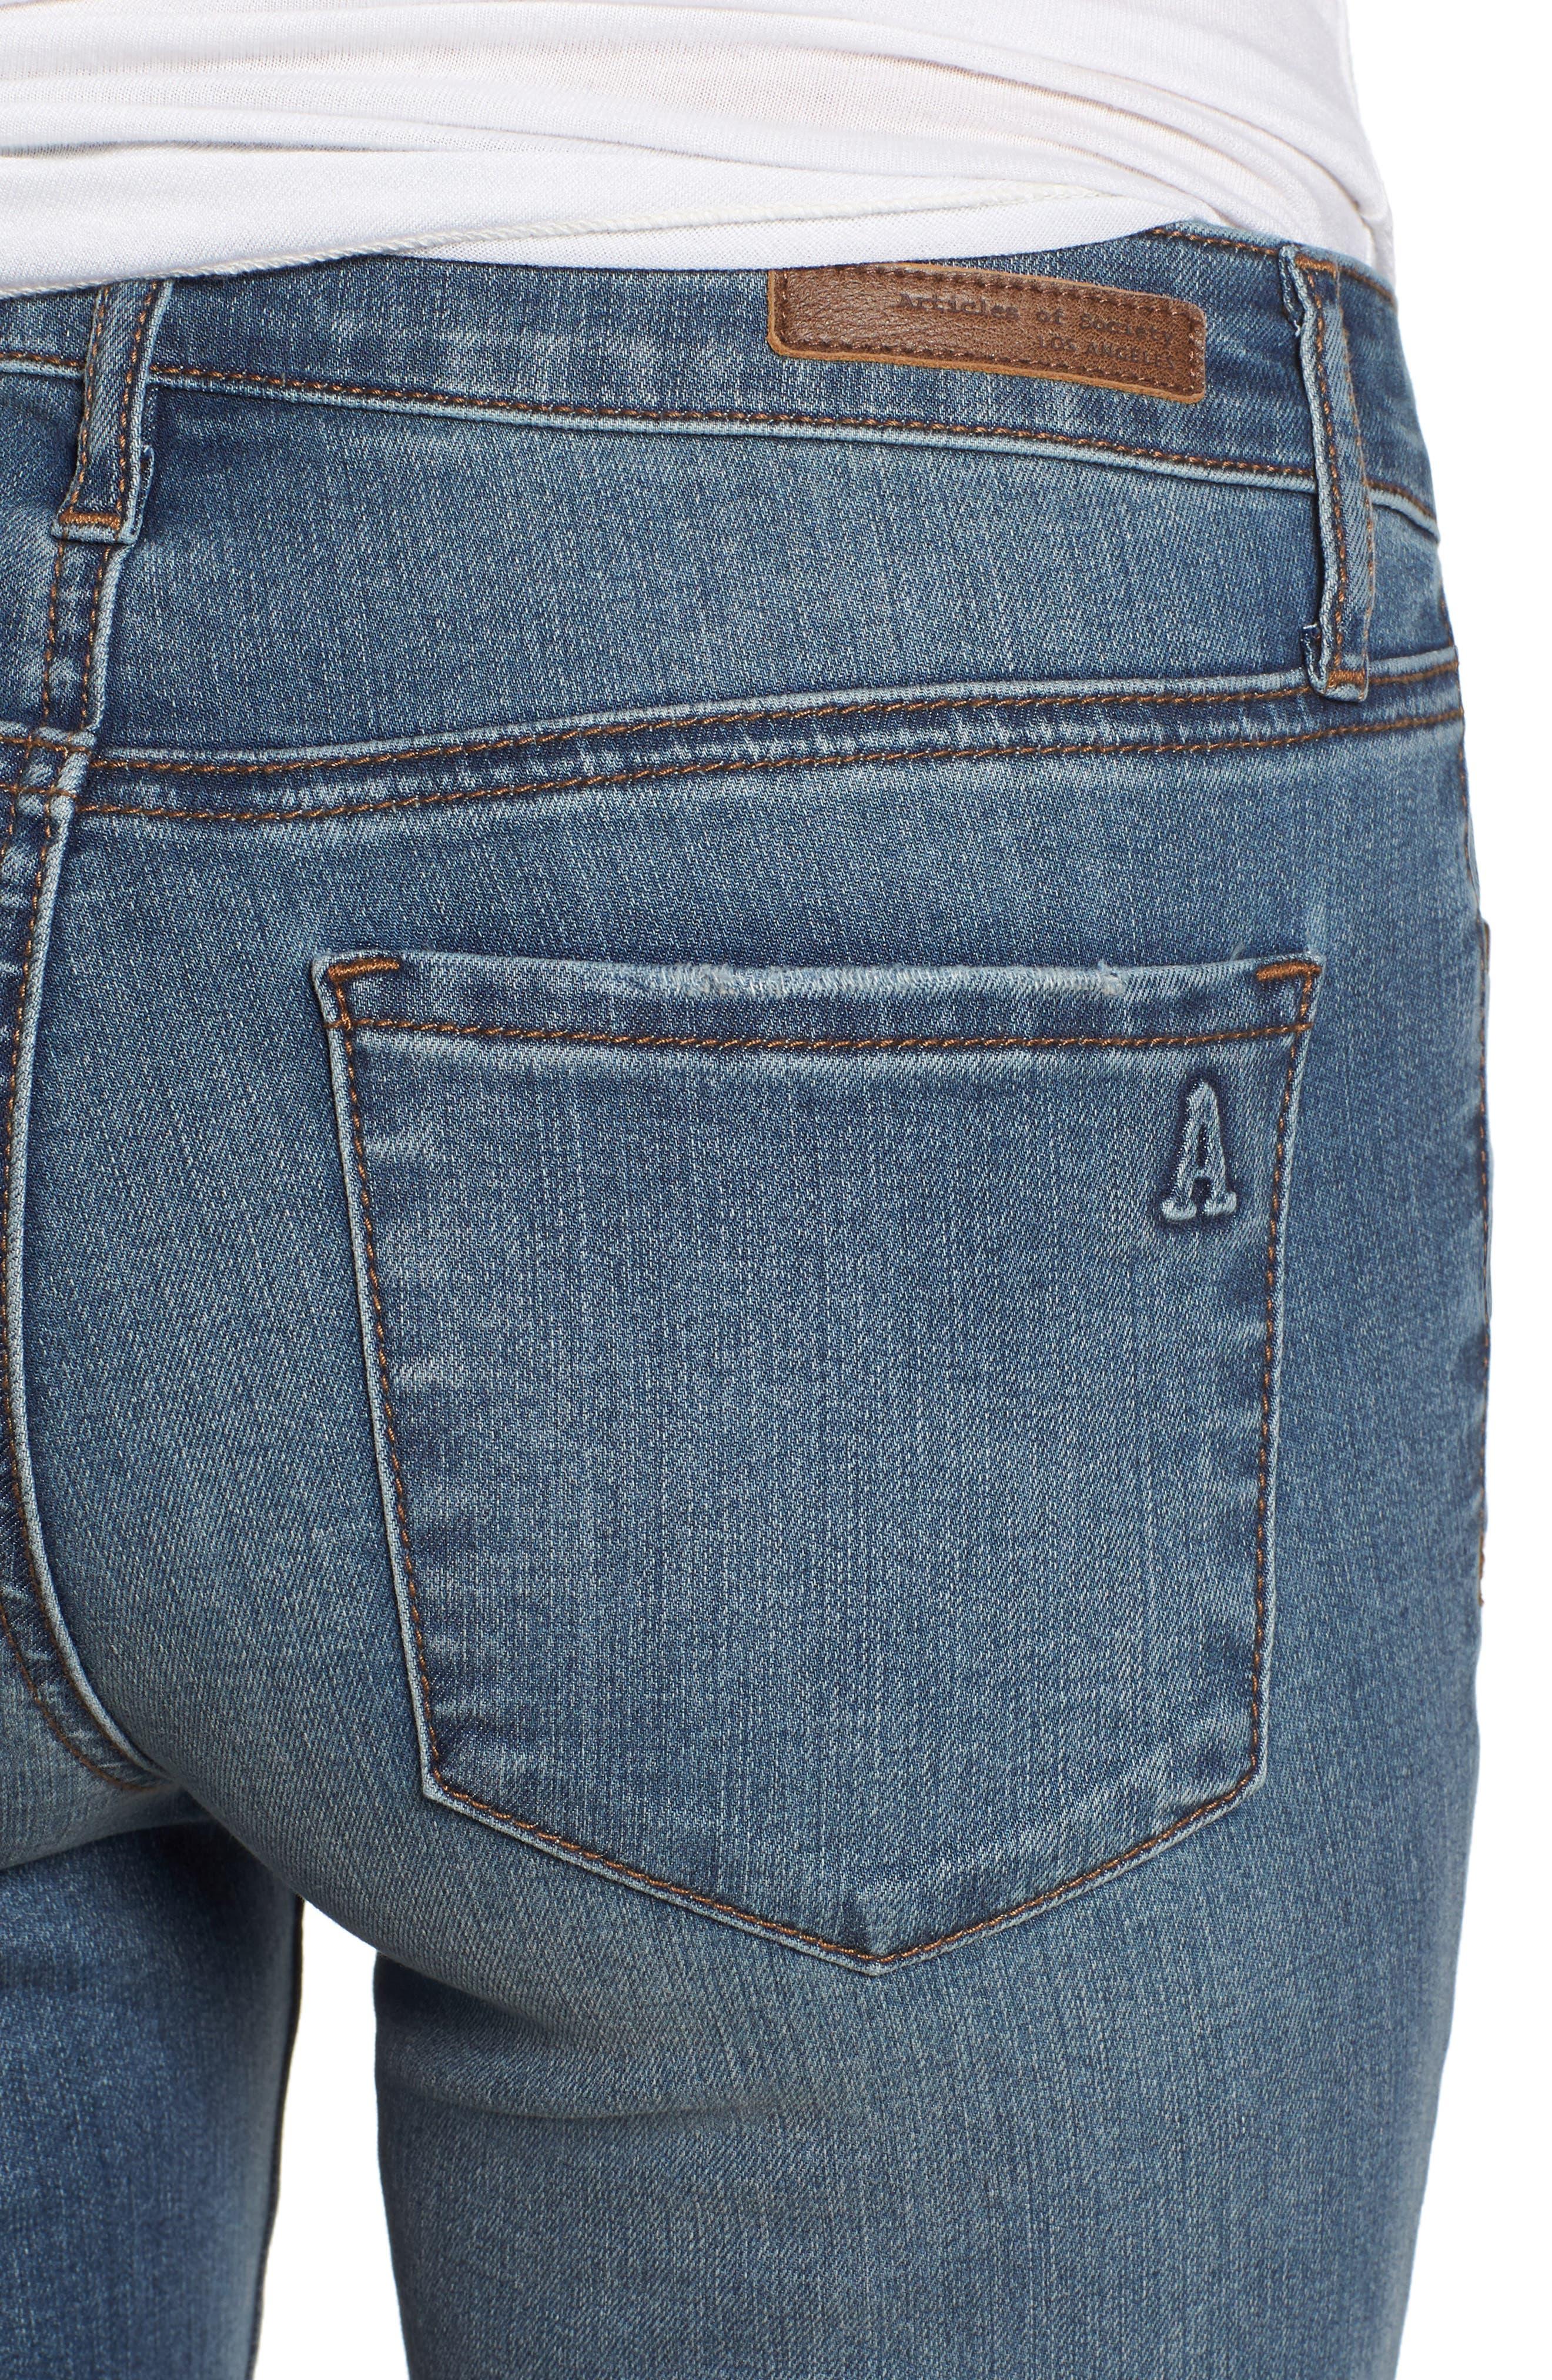 Sarah Skinny Jeans,                             Alternate thumbnail 4, color,                             400